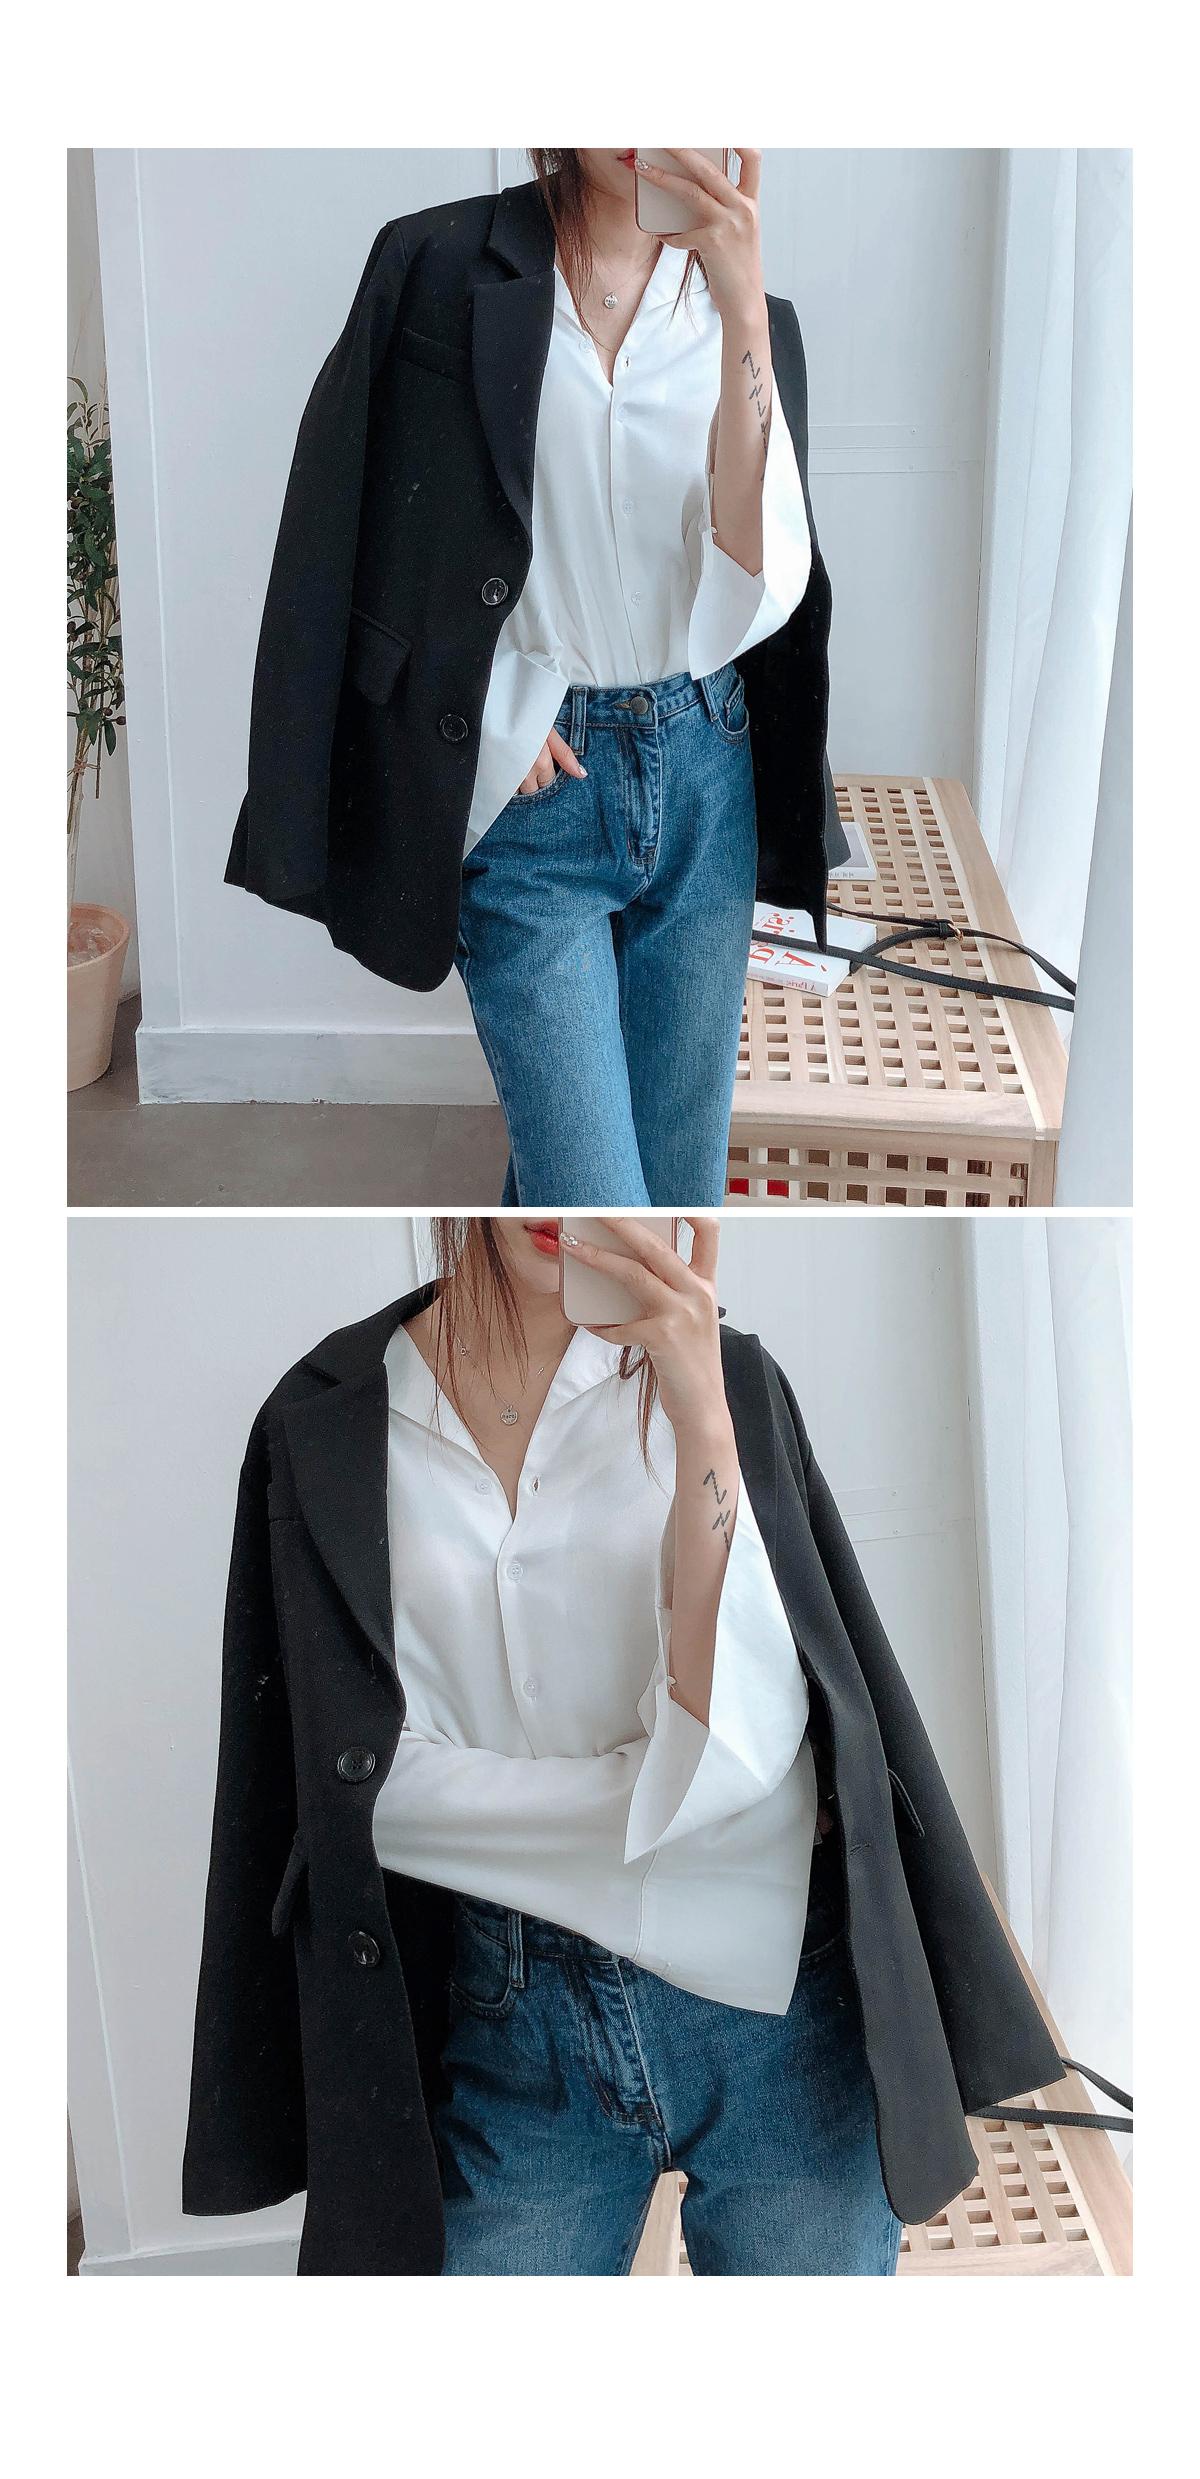 V neckla cuff shirts & blouses